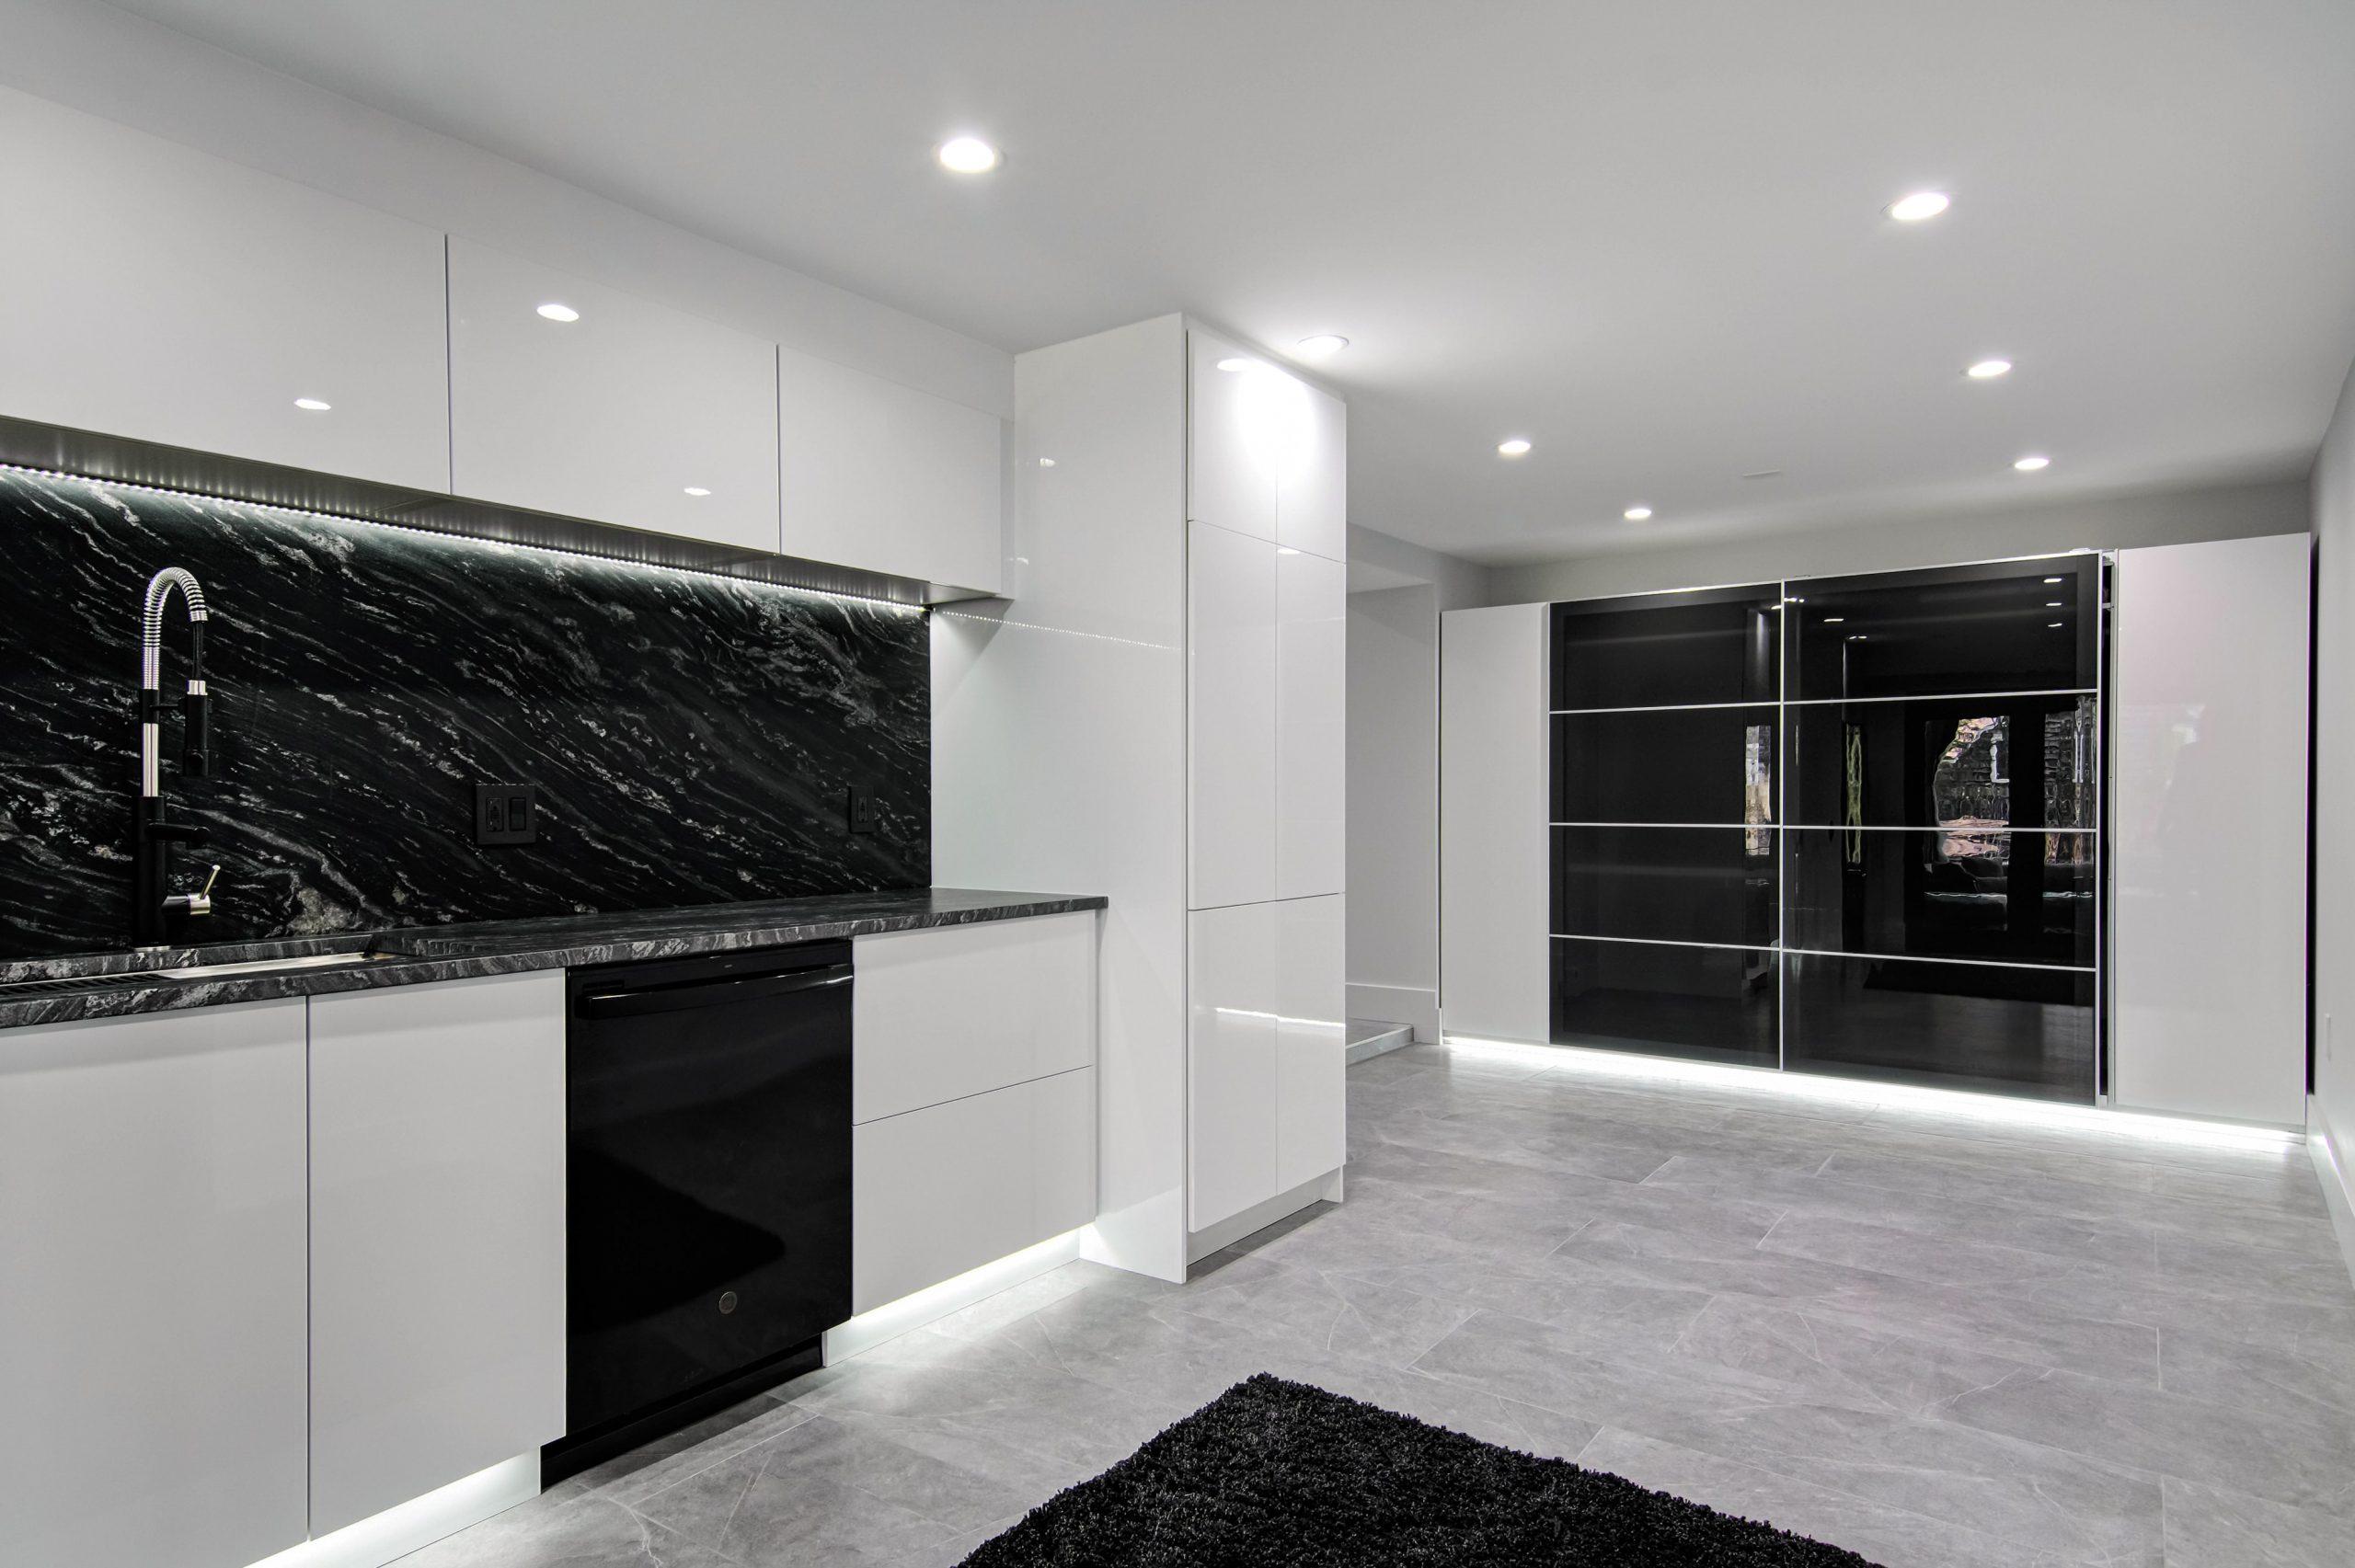 Updgraded Kitchen